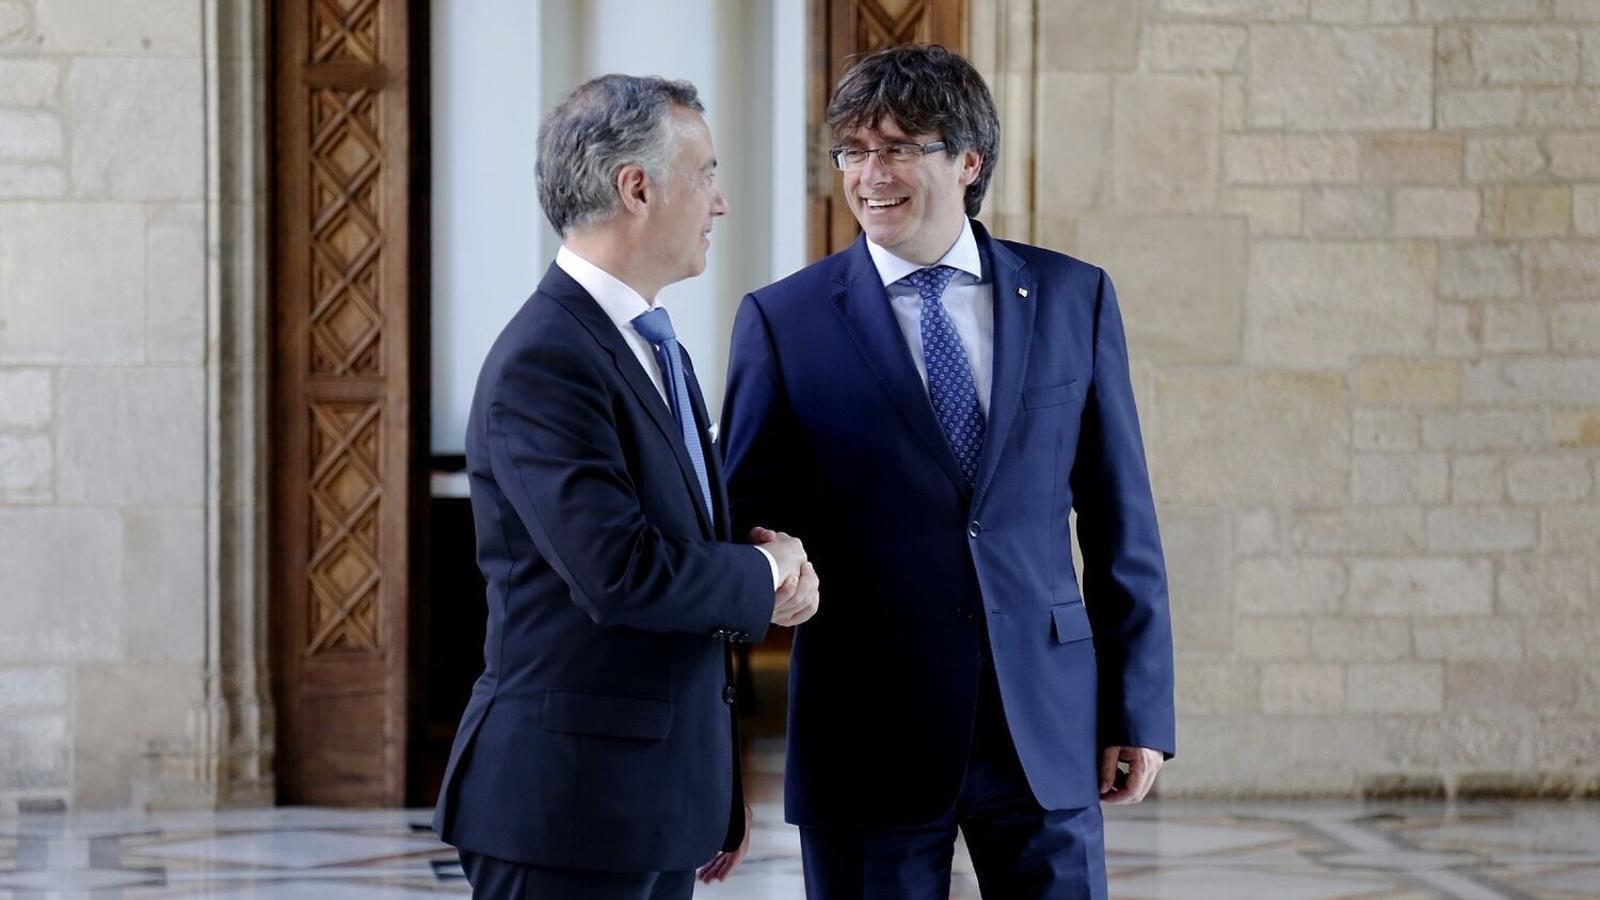 Generalitat-Carles-Puigdemont-Inigo-Urkullu_1817228476_51815782_1500x1001